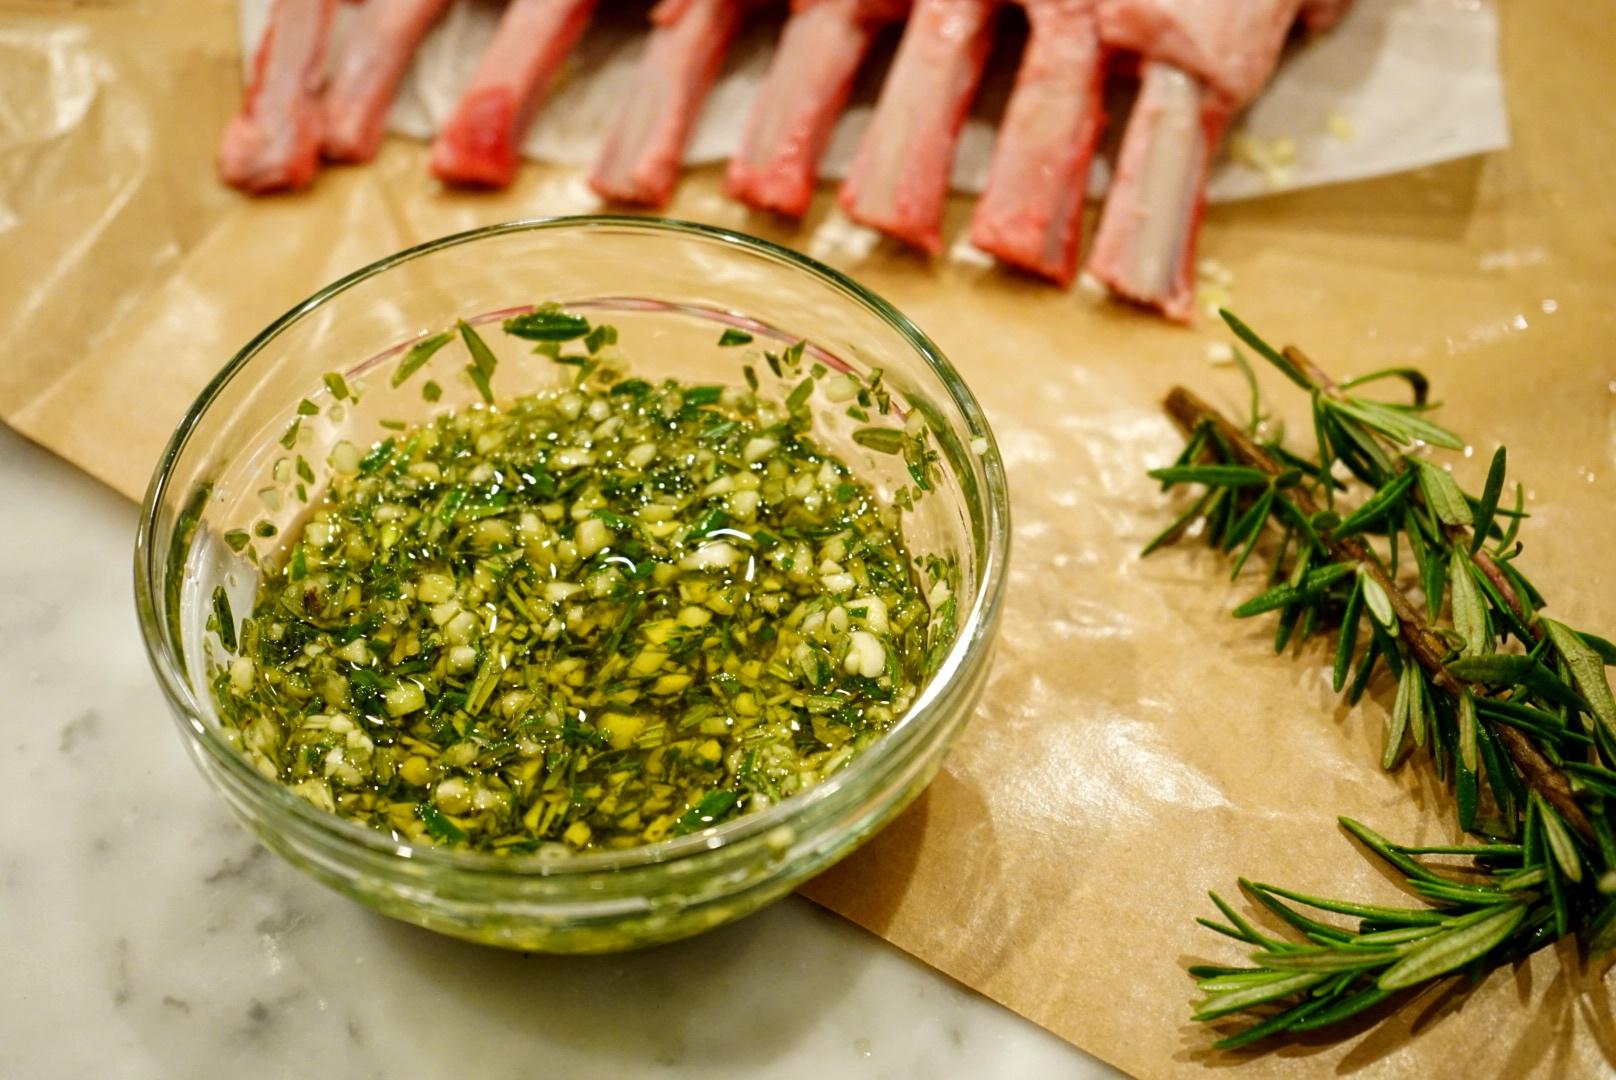 Olive oil, Rosemary and Garlic Rub.